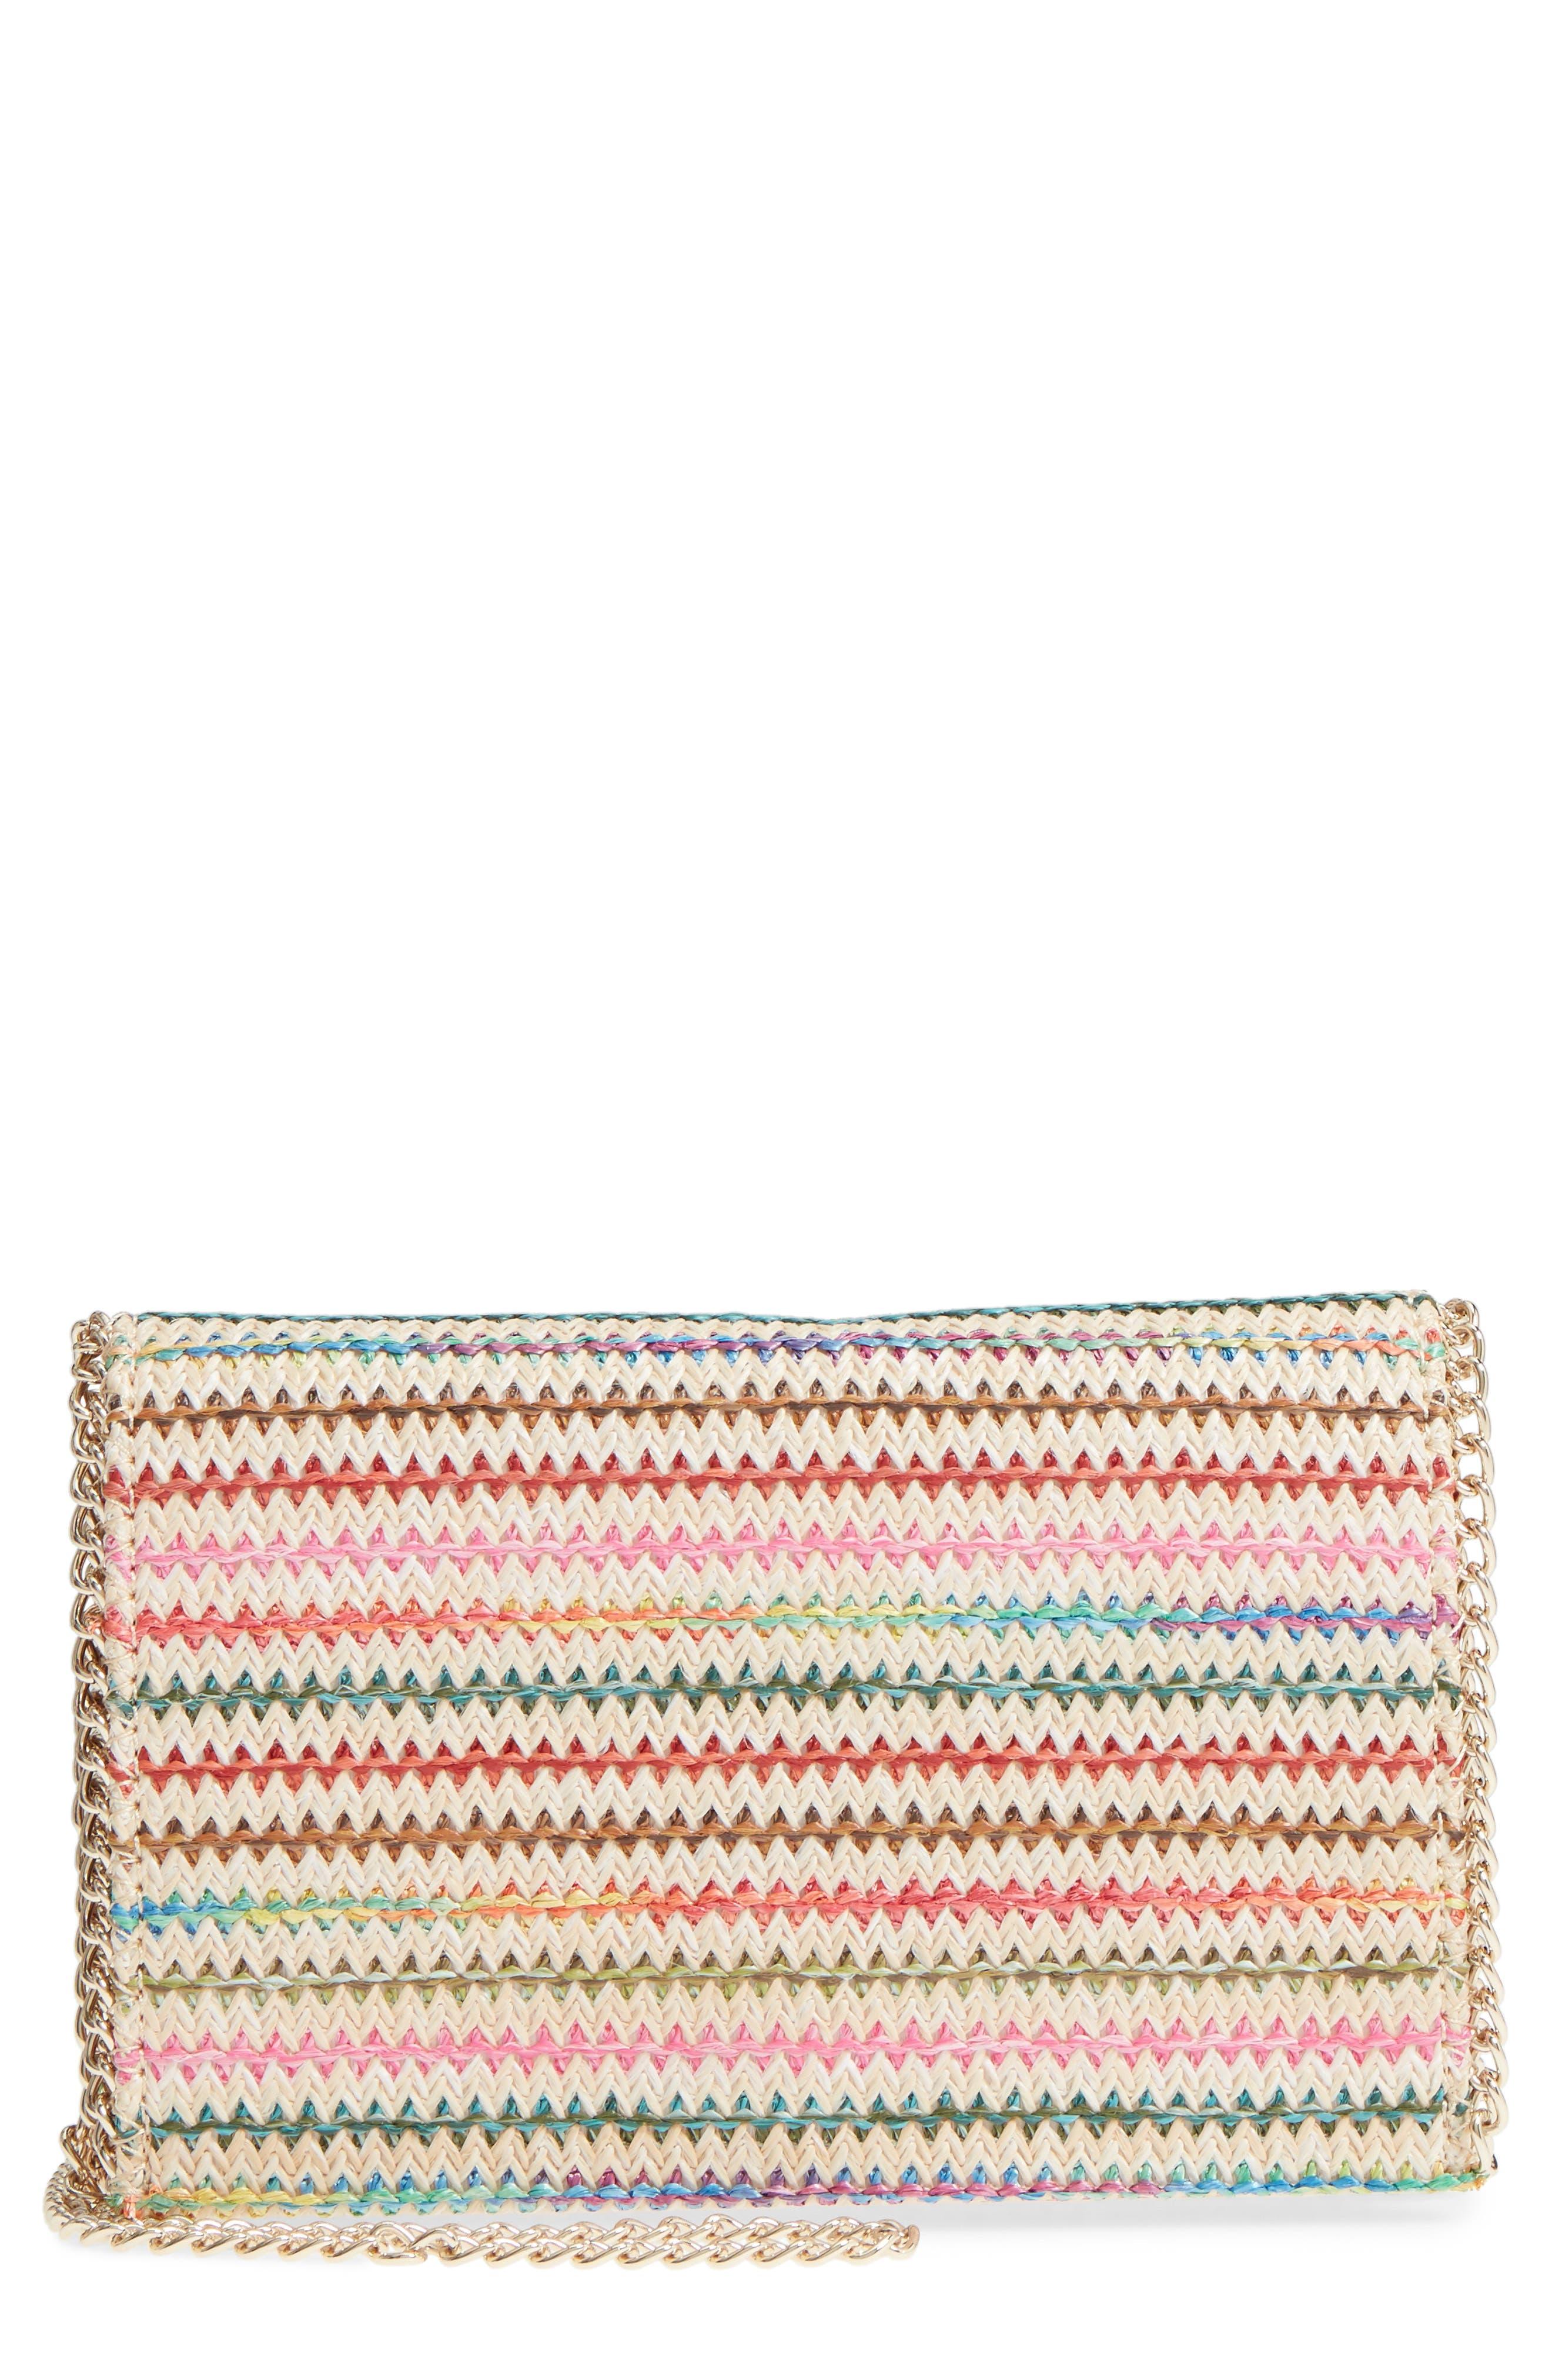 Multistripe Woven Clutch,                             Main thumbnail 1, color,                             600